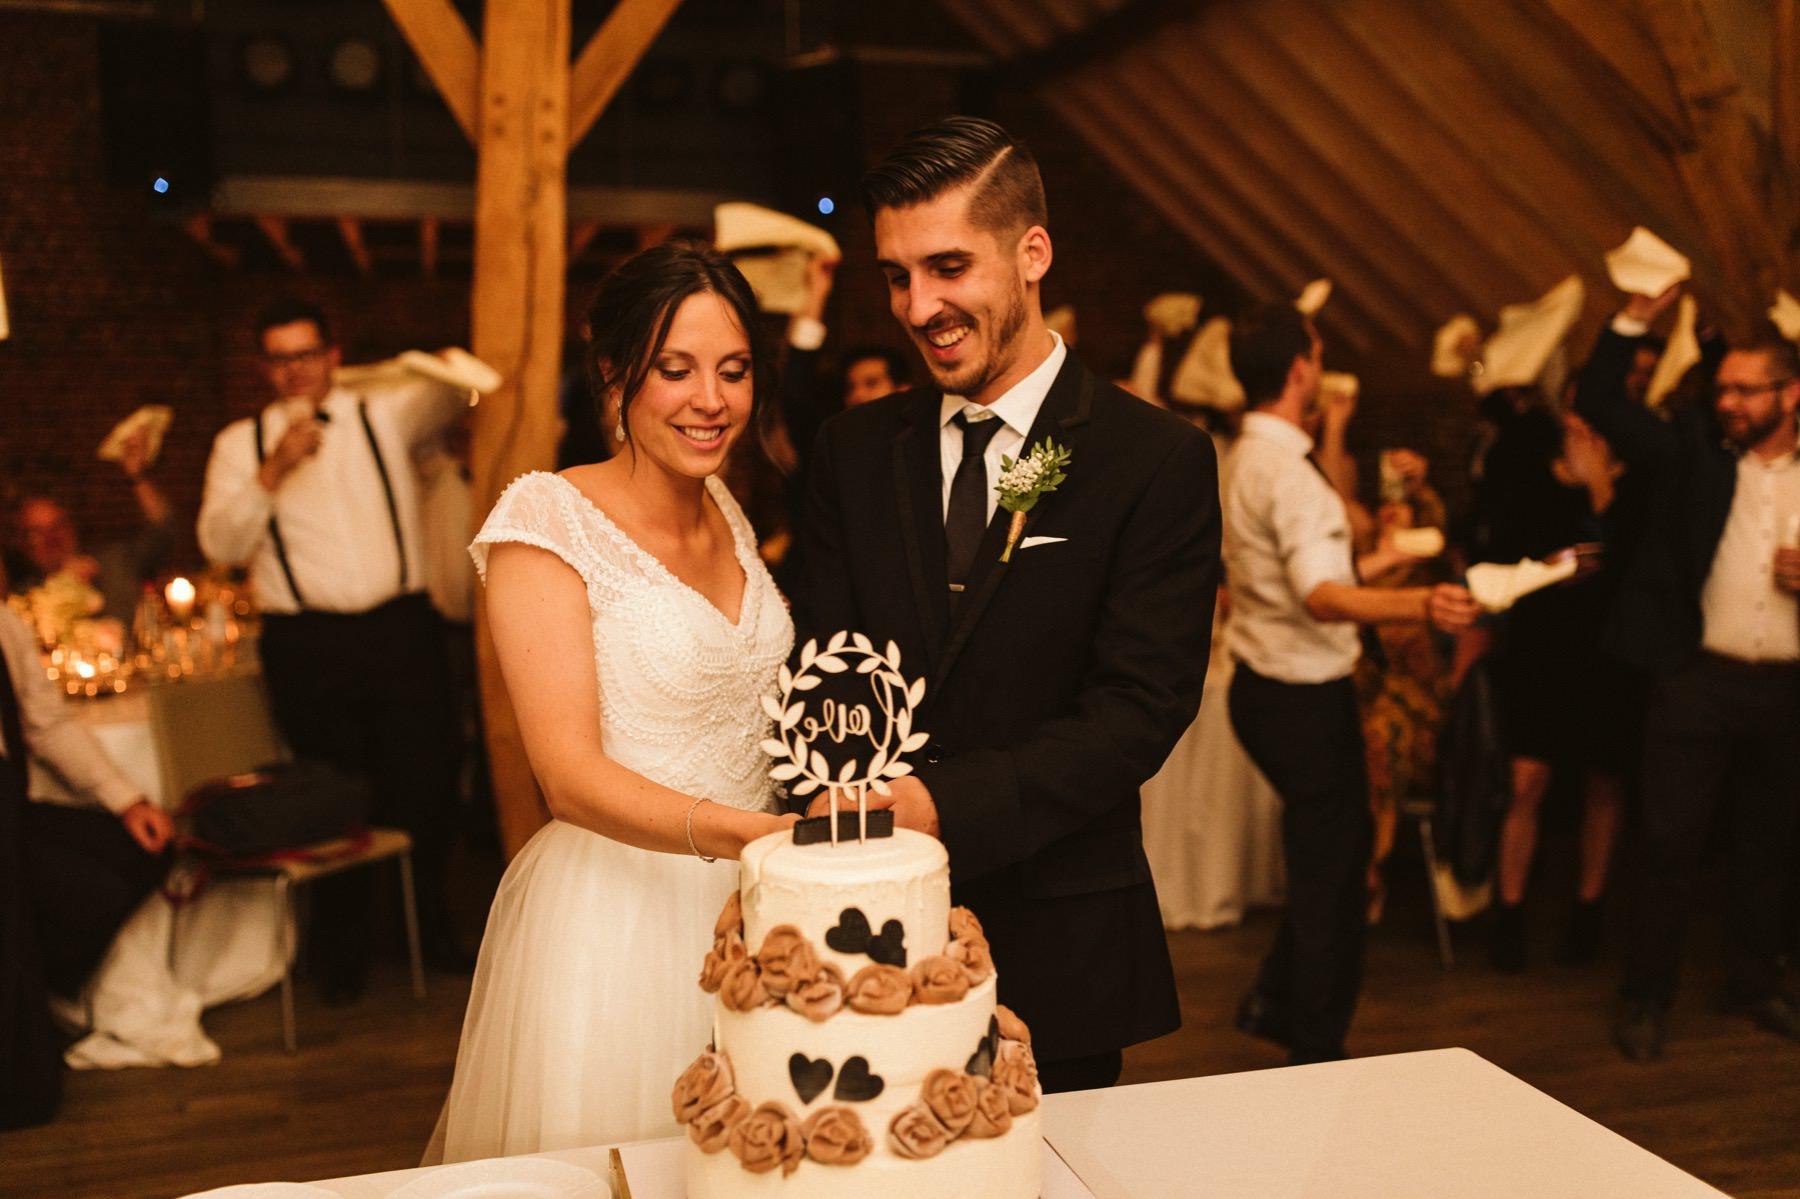 Lennik wedding